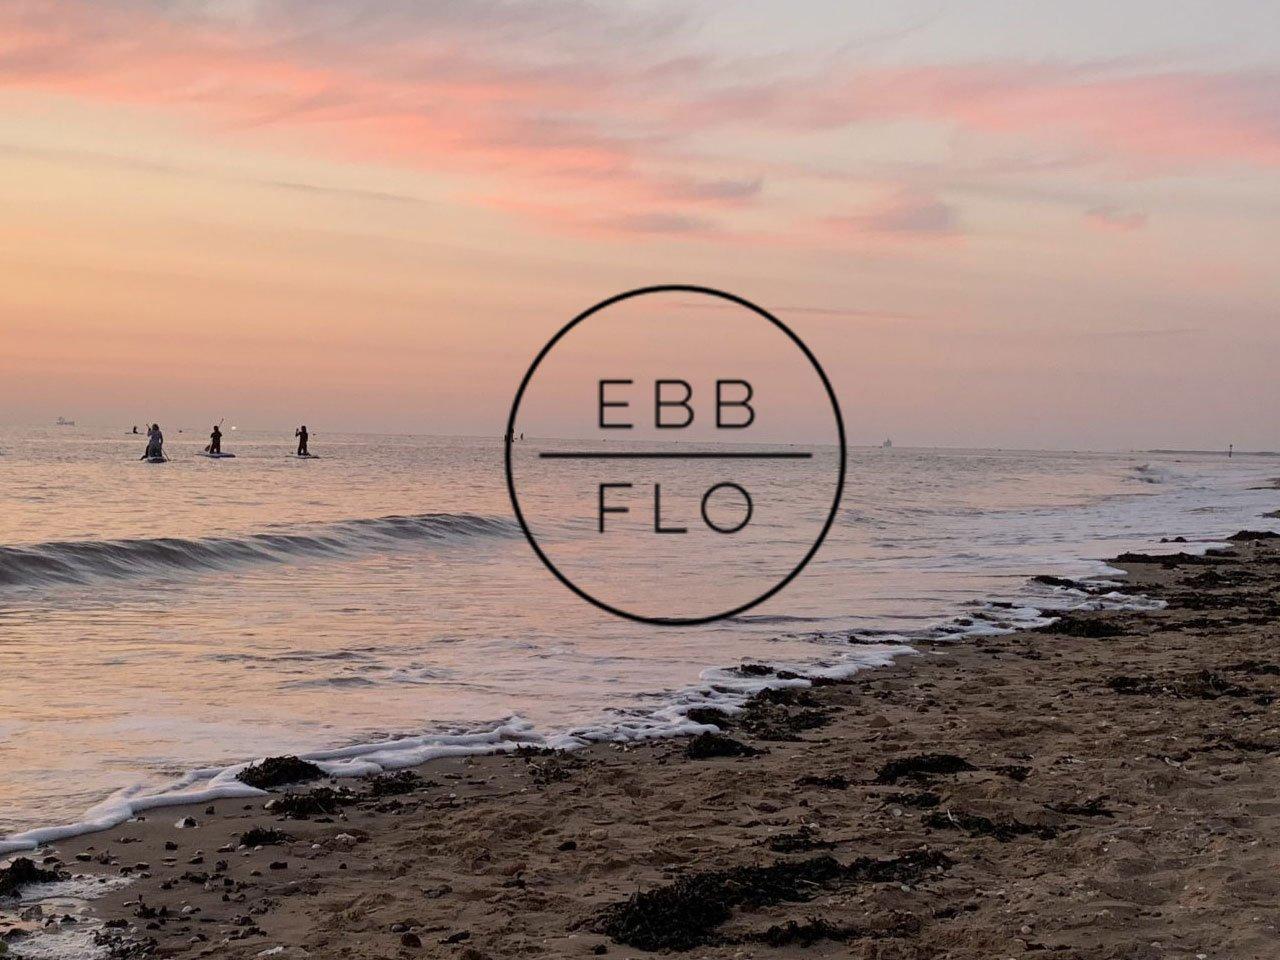 cleethorpes beach with ebb flow logo